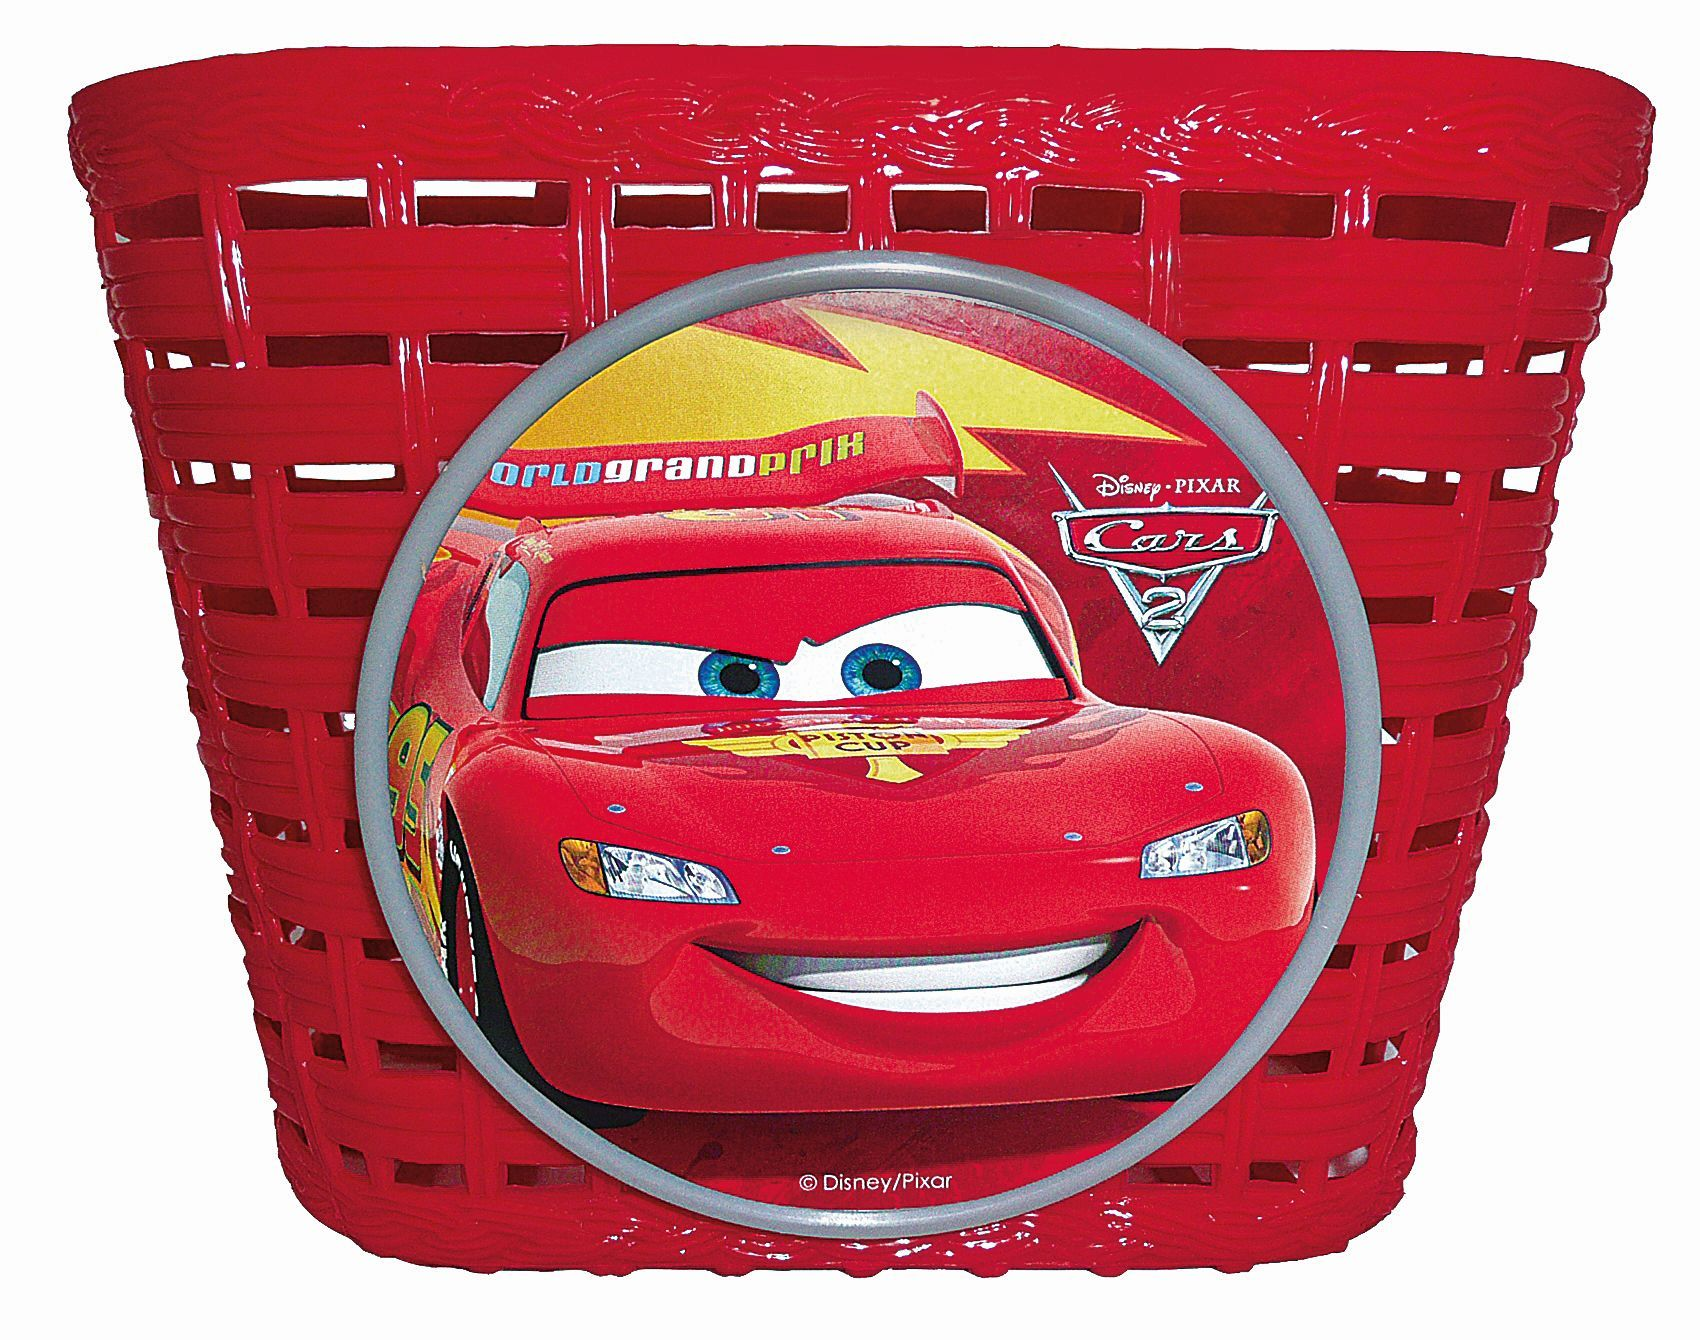 körbe, taschen, puppensitze/Kinderartikel: Mattel  Lenkerkorb Cars